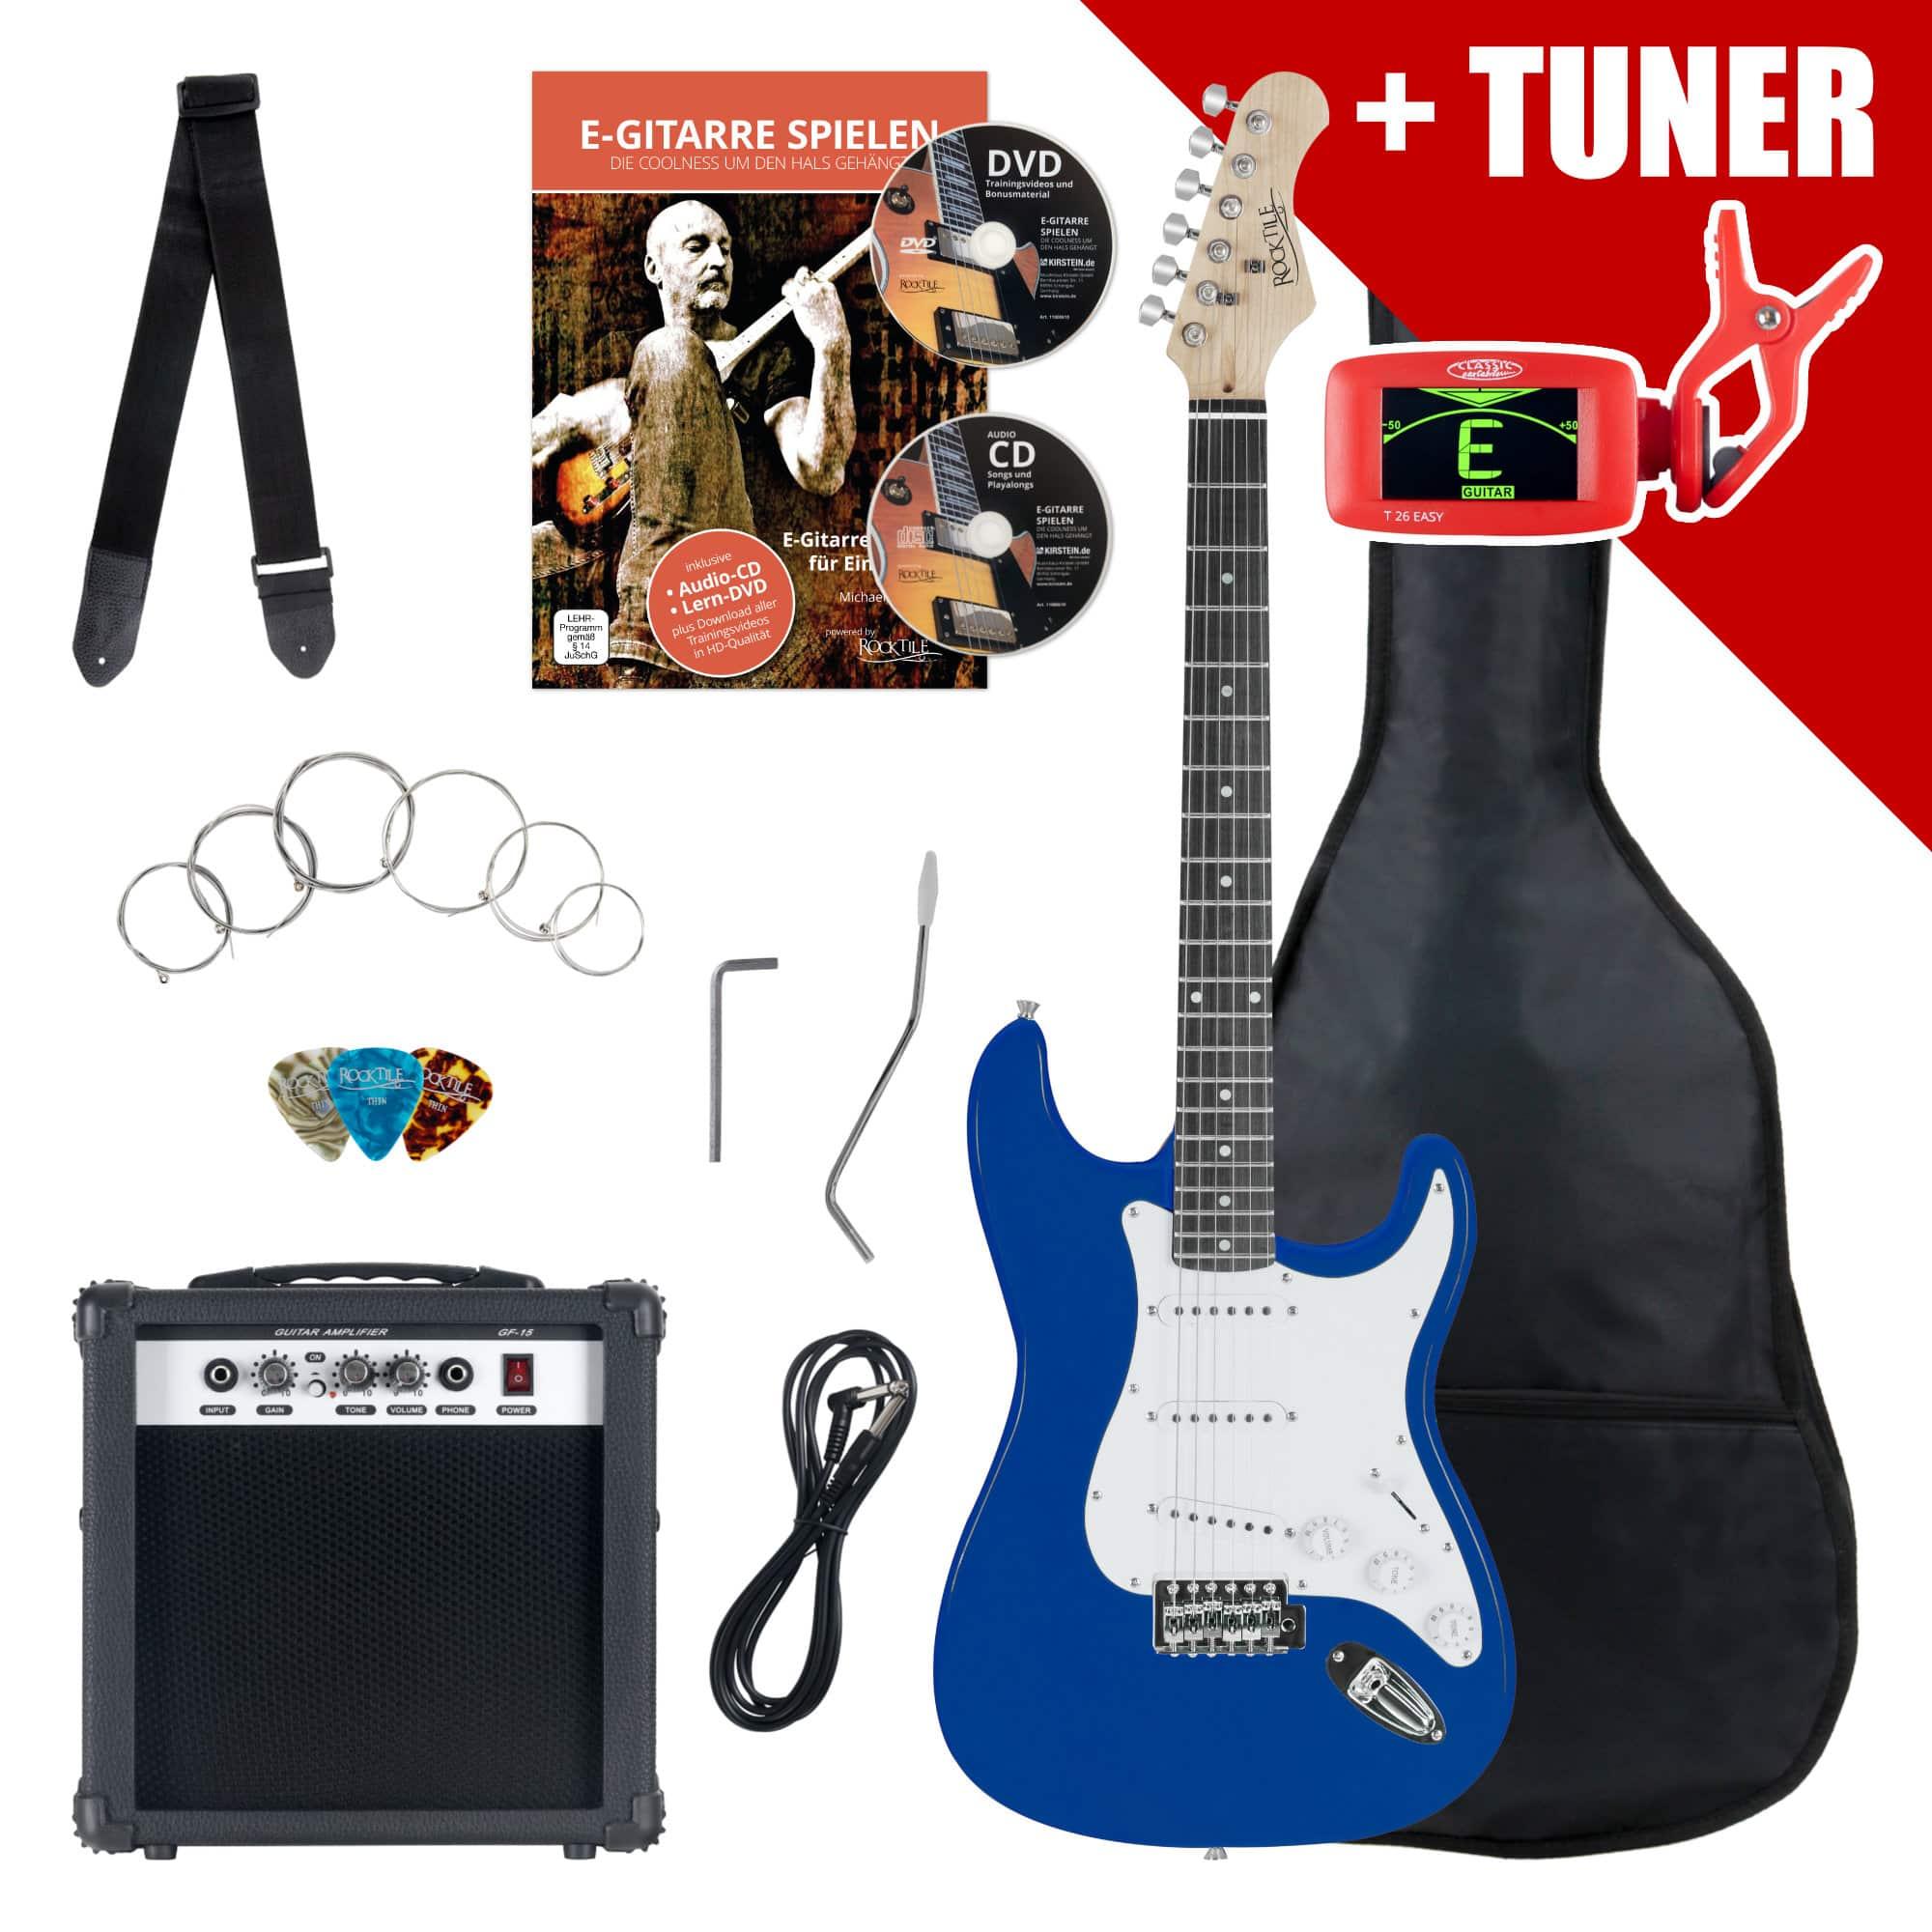 Rocktile ST Pack E Gitarre Set Blue inkl. Verstärker, Tasche, Stimmgerät, Kabel, Gurt, Saiten und Schule inkl. CD|DVD